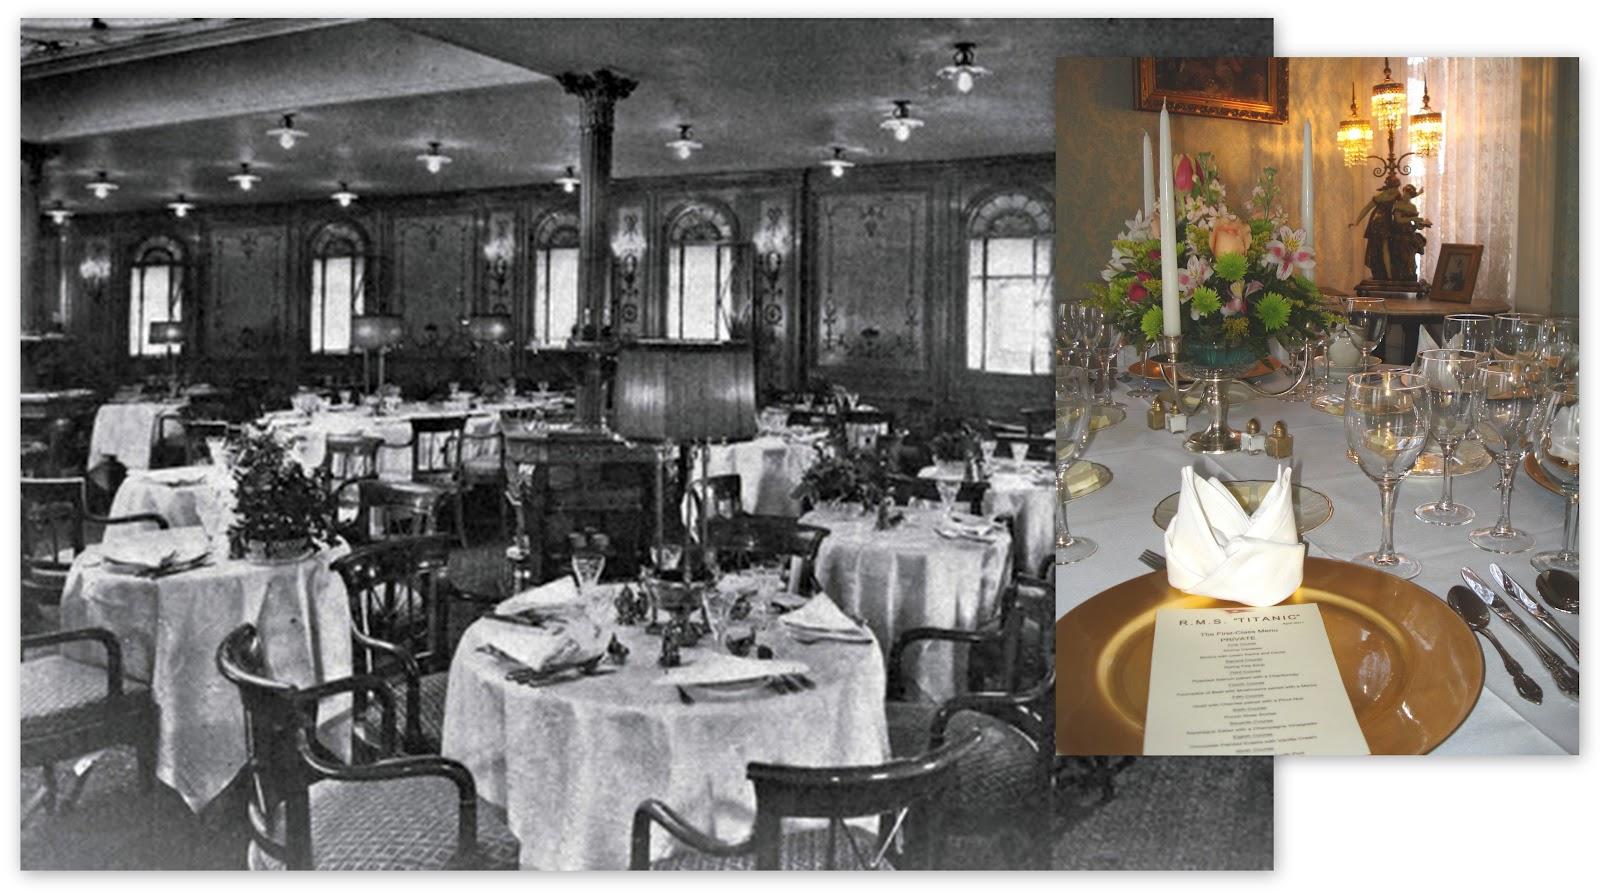 100th anniversary celebrating the titanic dinner and tea dinner on the titanic 100th anniversary